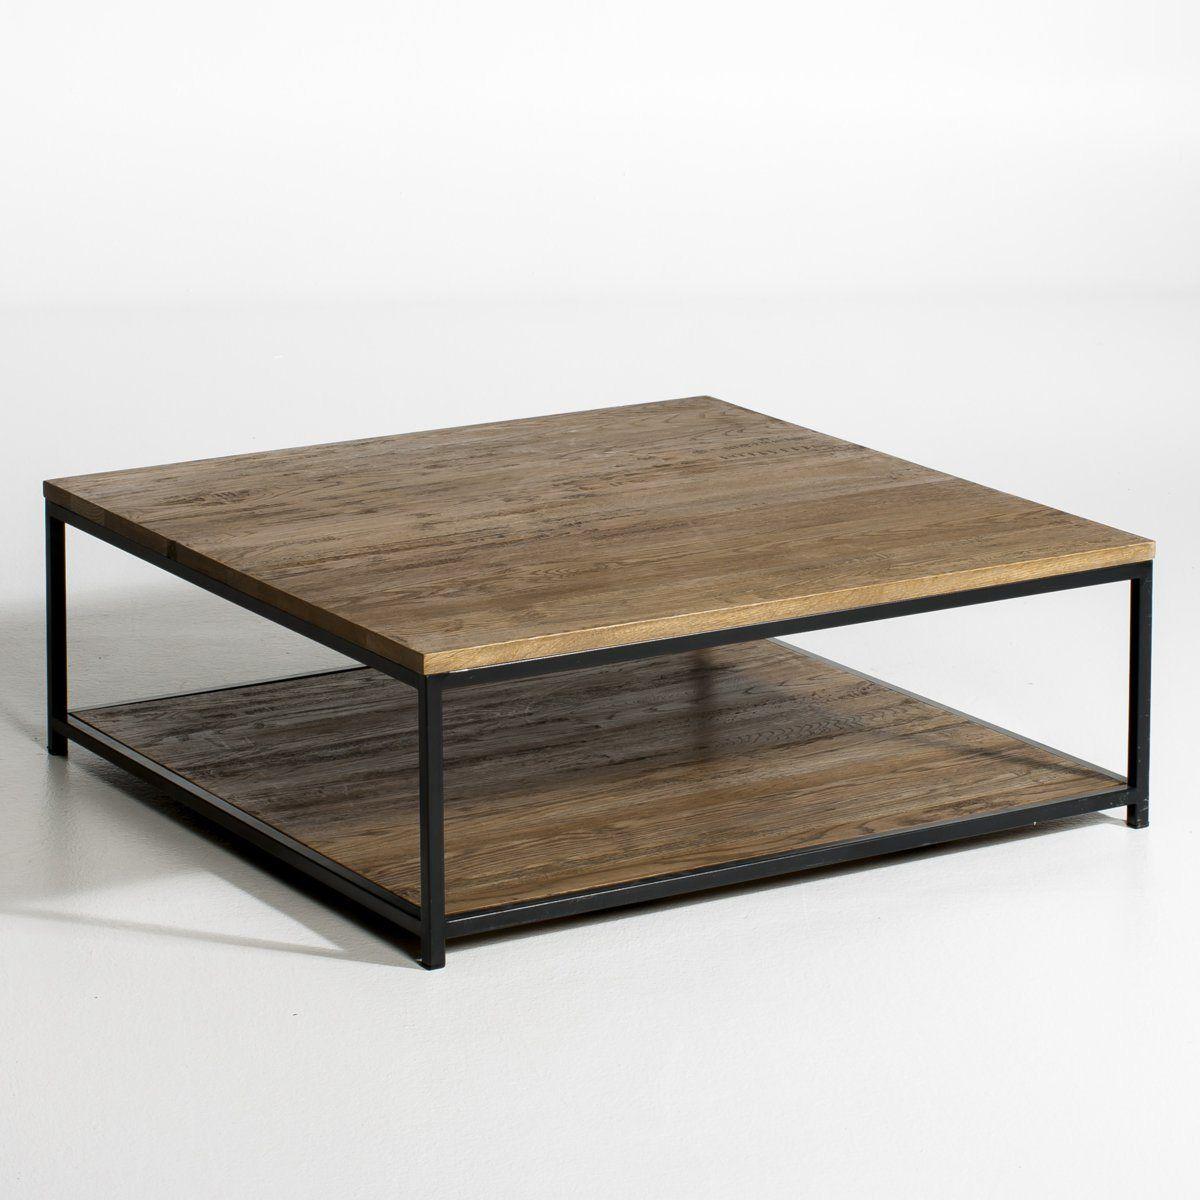 Table Basse Chene Et Metal Aranza 2 Tailles Table Basse Chene Table Basse Idee Table Basse